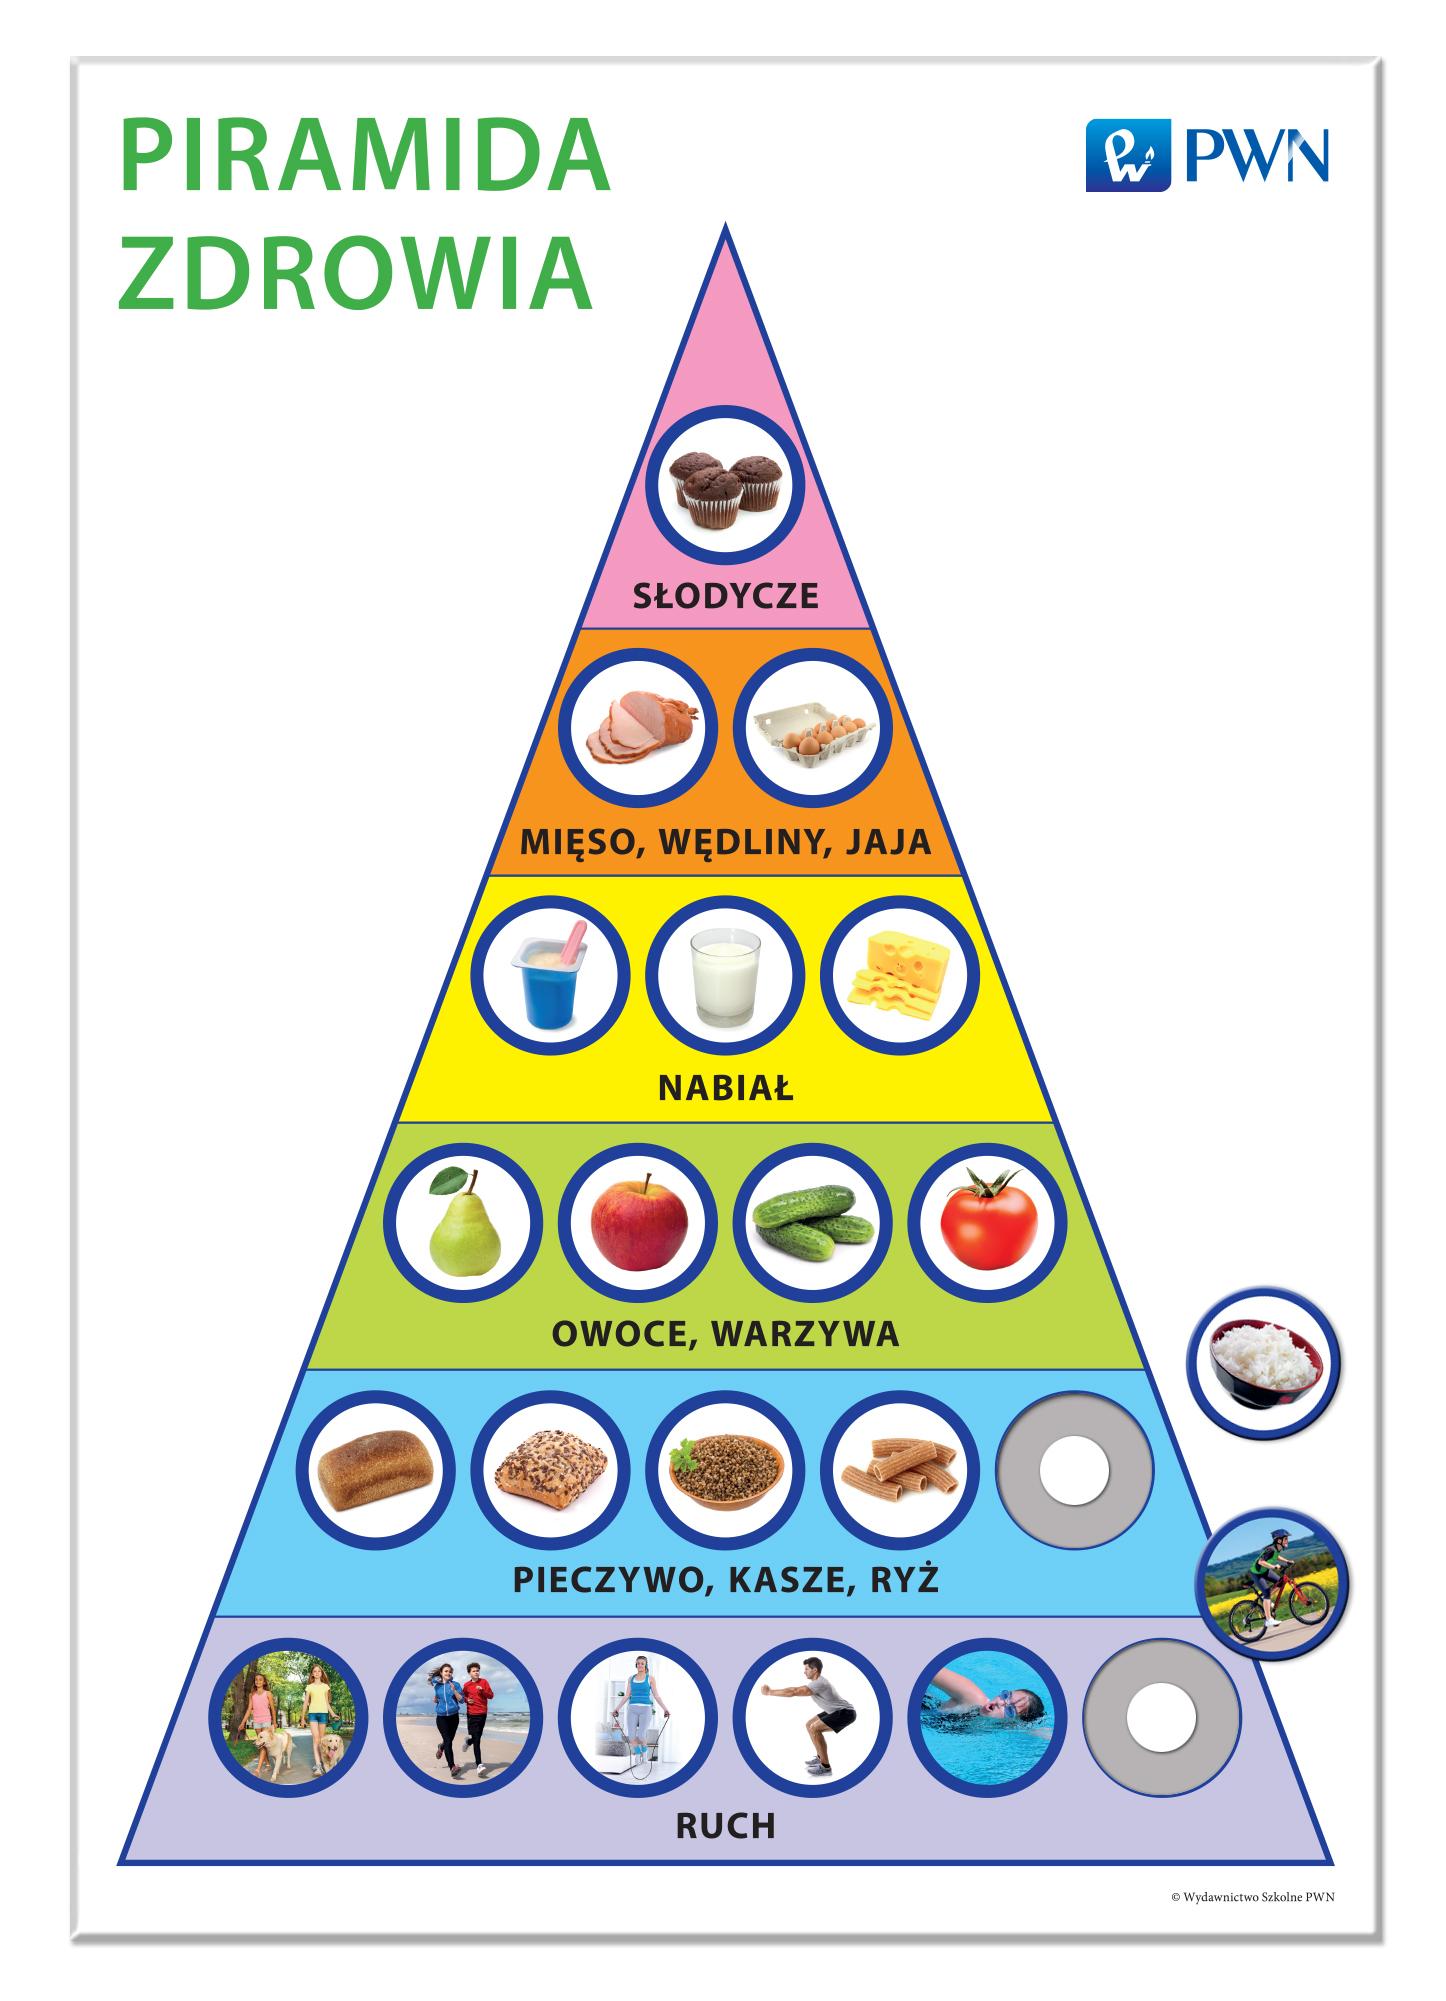 Piramida_zdrowia.jpg